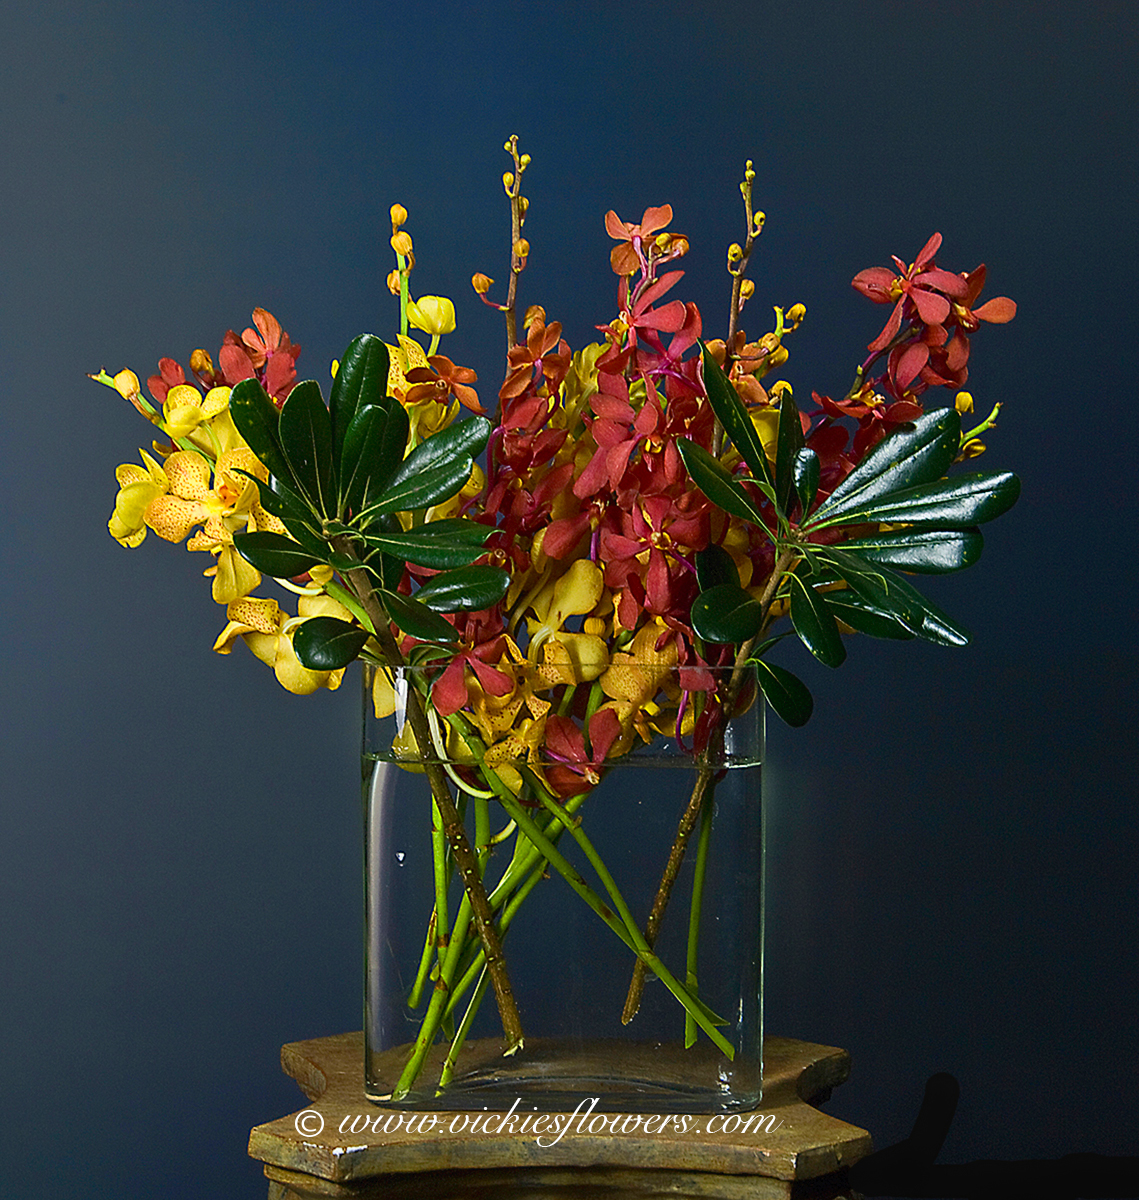 Ikebana Asian Flower Arrangements Vickies Flowers Brighton Co